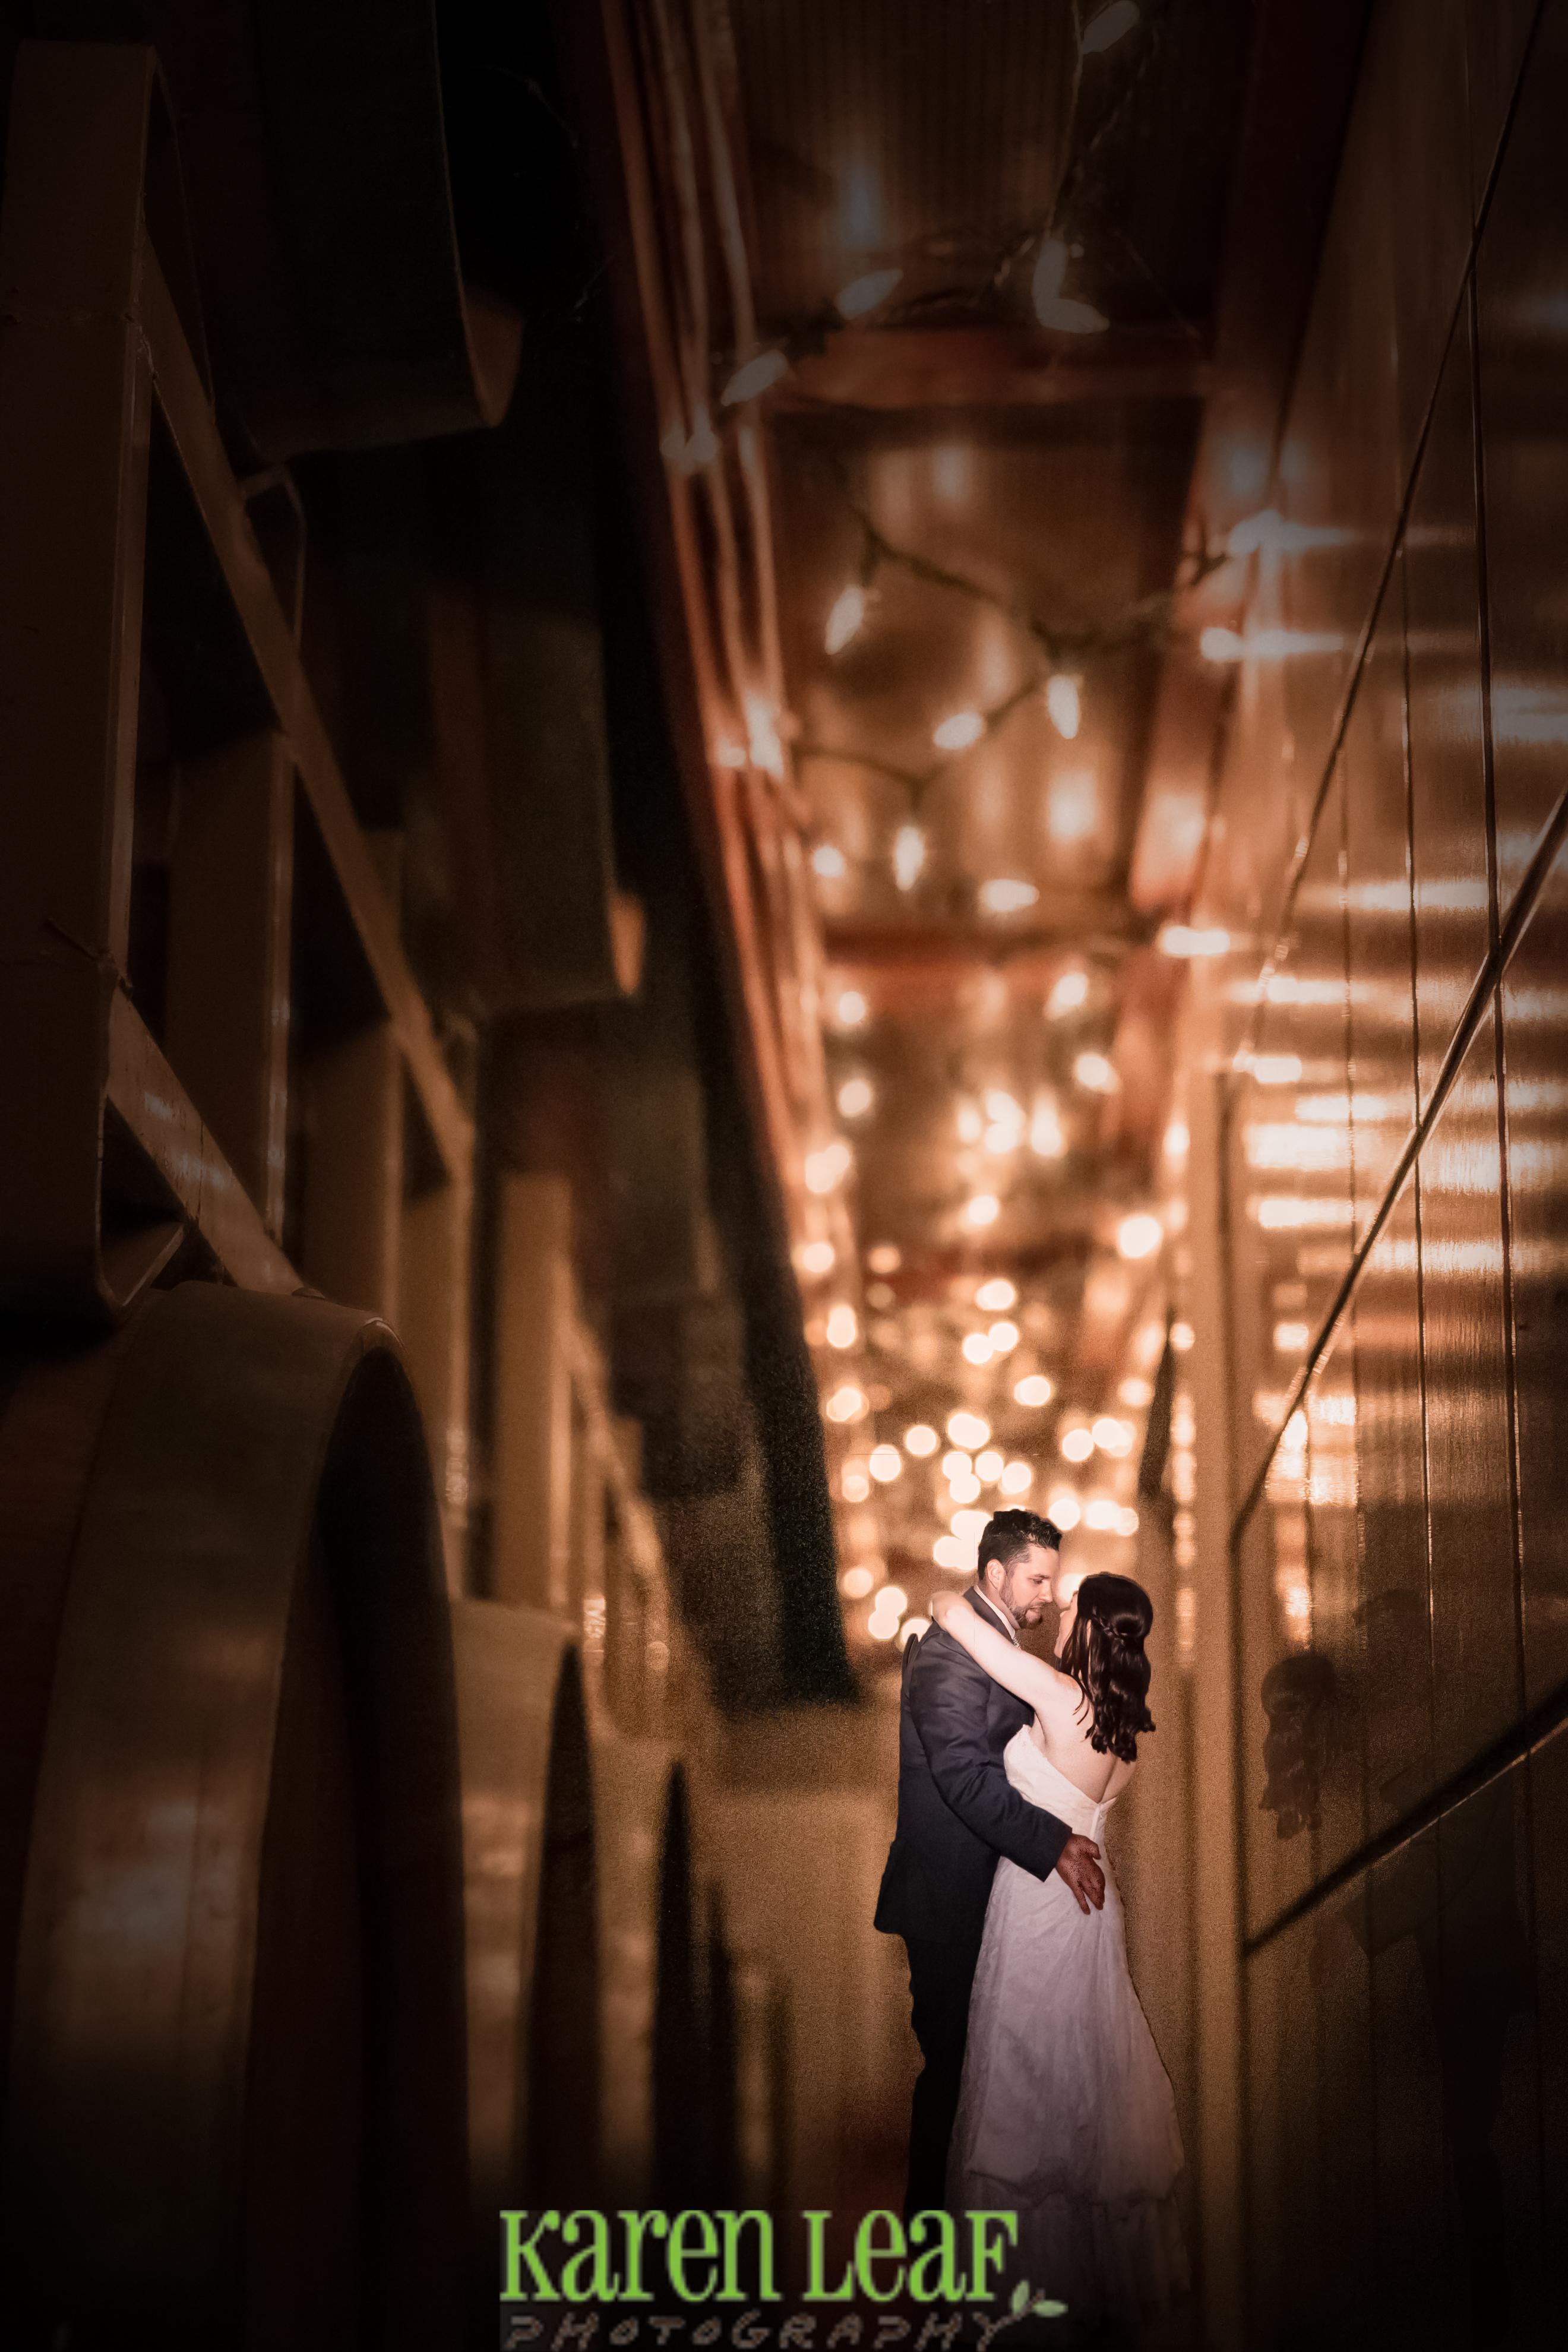 A stolen moment at their wedding